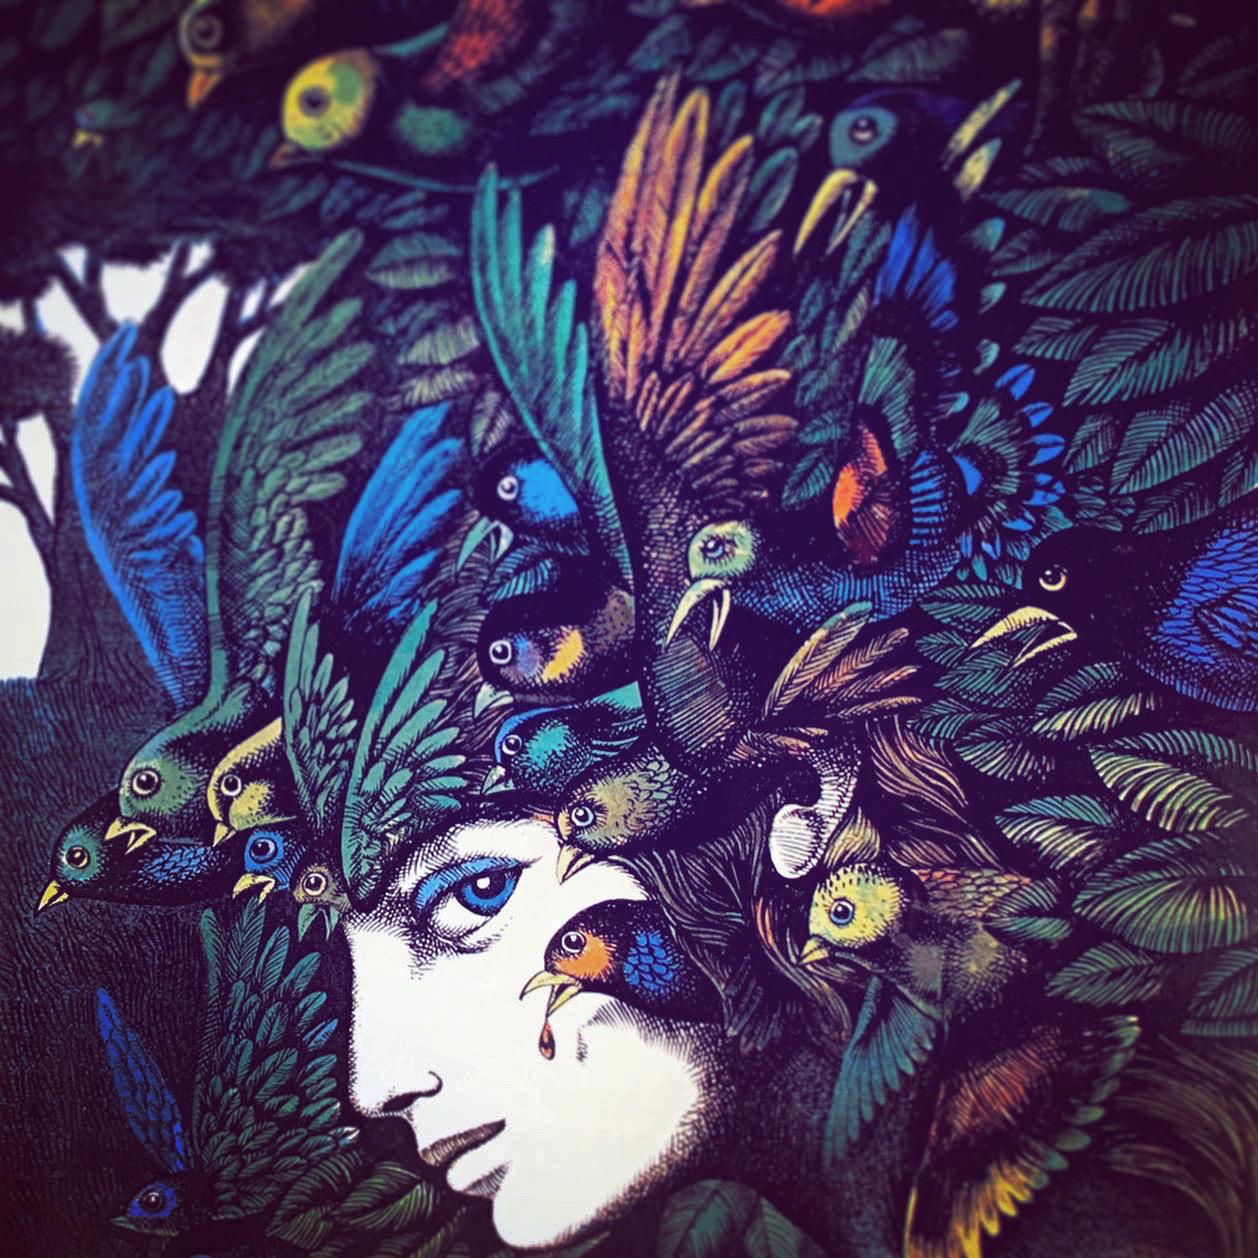 Fågelflicka